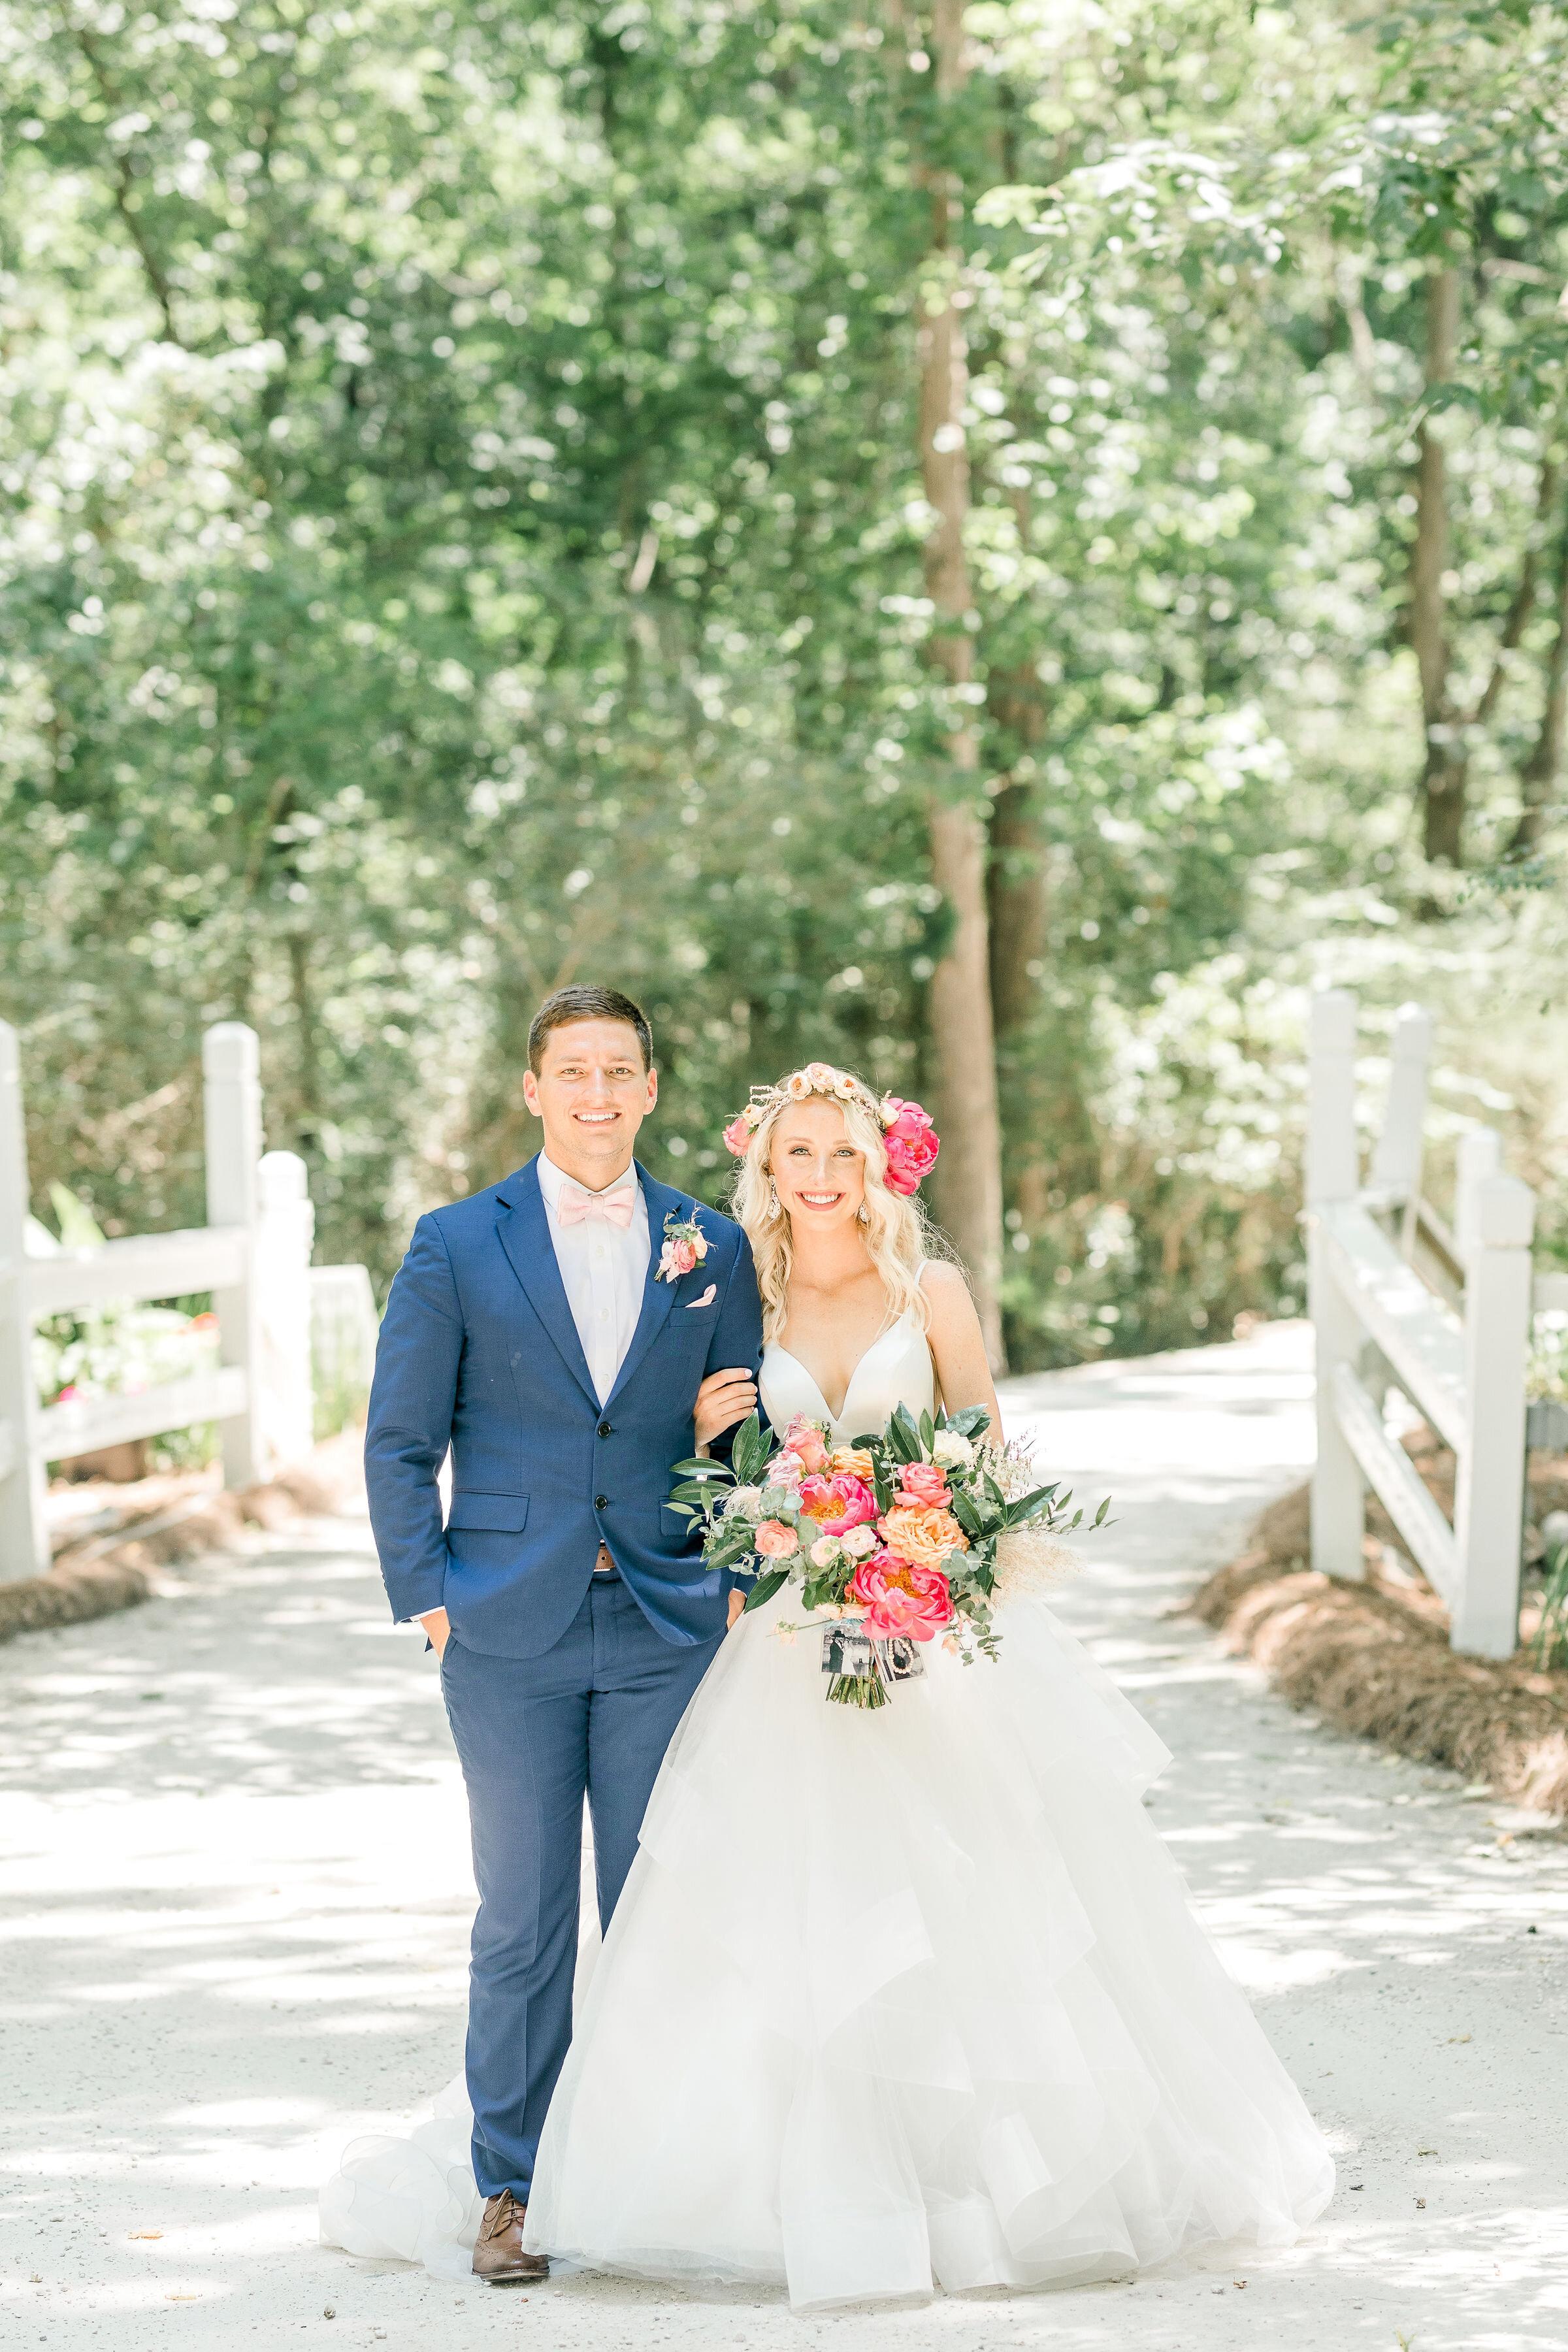 abigale-and-kody-ivory-and-beau-savannah-wedding-mackey-house-wedding-lamour-by-calla-blanche-tatum-savannah-bride-savannah-florist-hot-pink-wedding-flowers-mackey-house-florist-southern-wedding.jpg